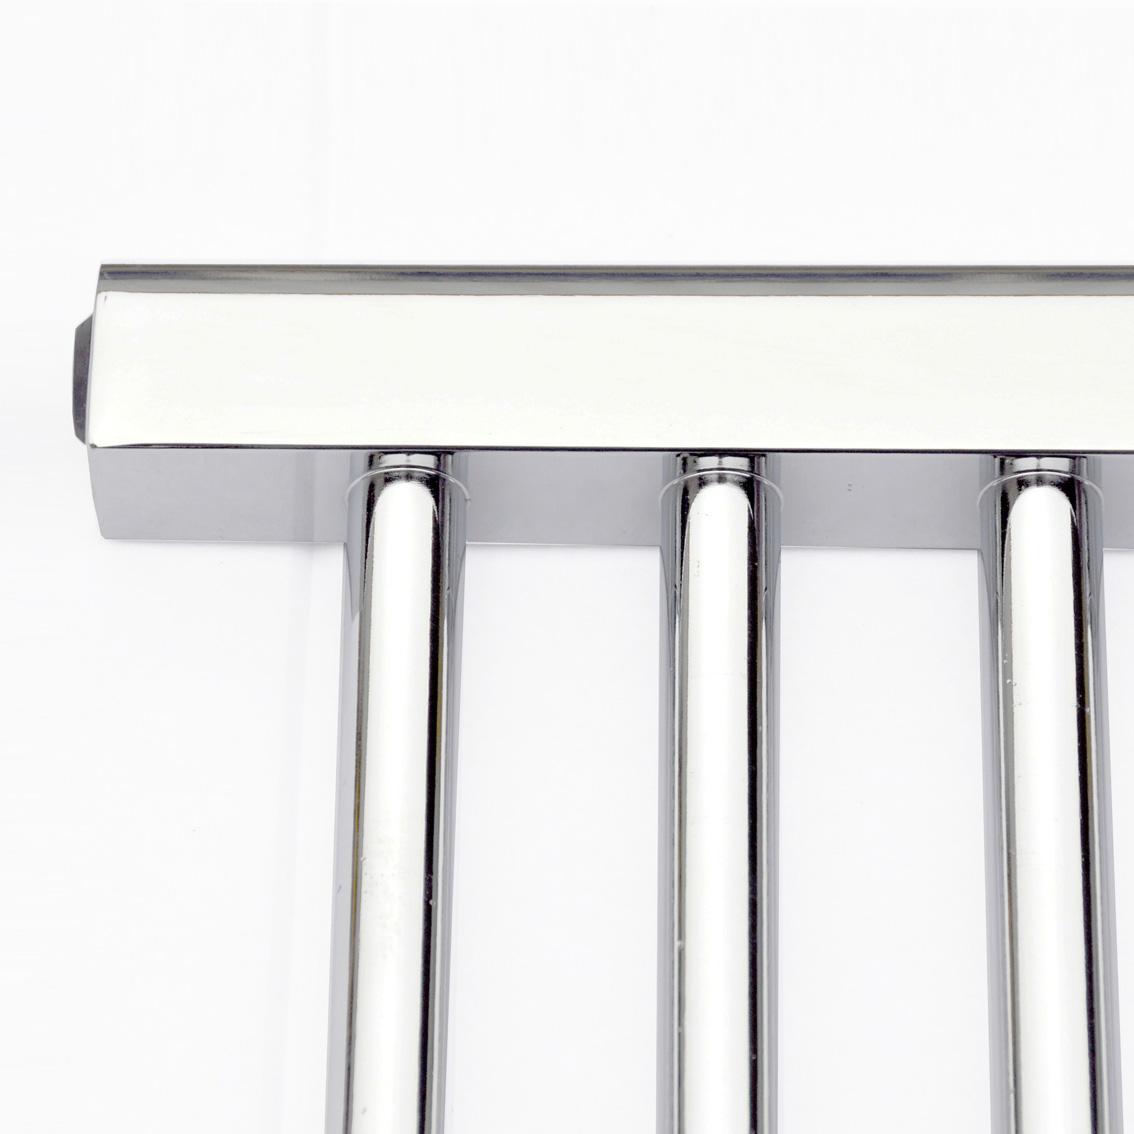 Natasha ladder rail straight modern electric towel radiator in chrome - 1200 X 400 Thermostatic Electric Towel Rail